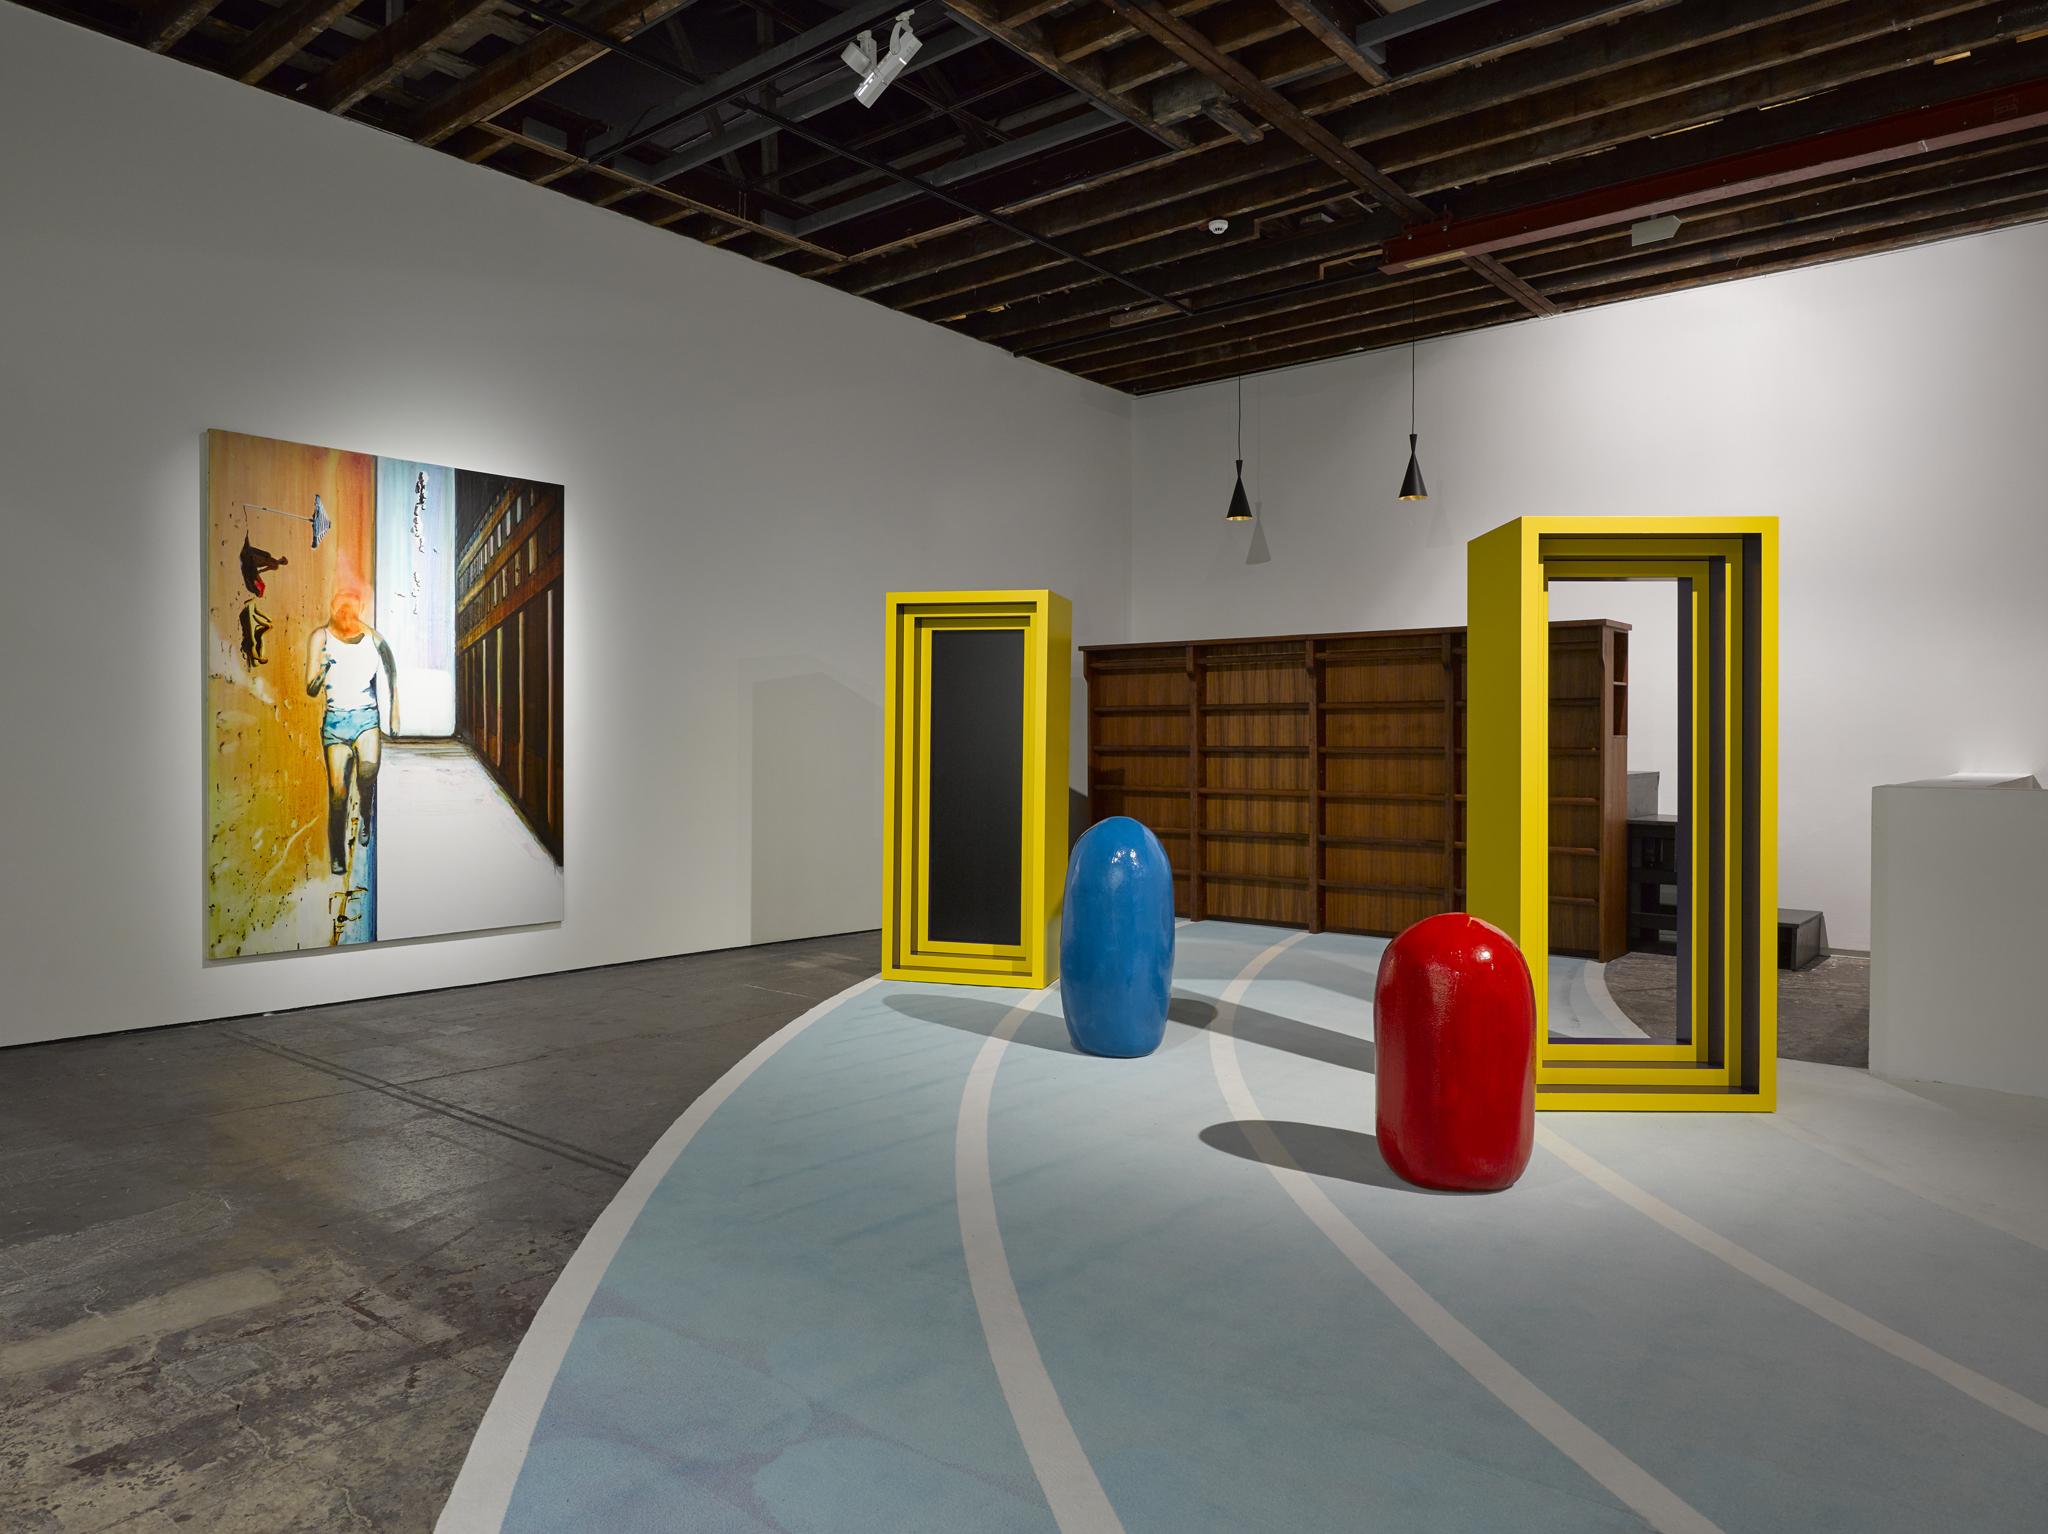 John Kørner, Installation view, Life in a Box, © John Kørner. Courtesy the artist and Victoria Miro, London/Venice